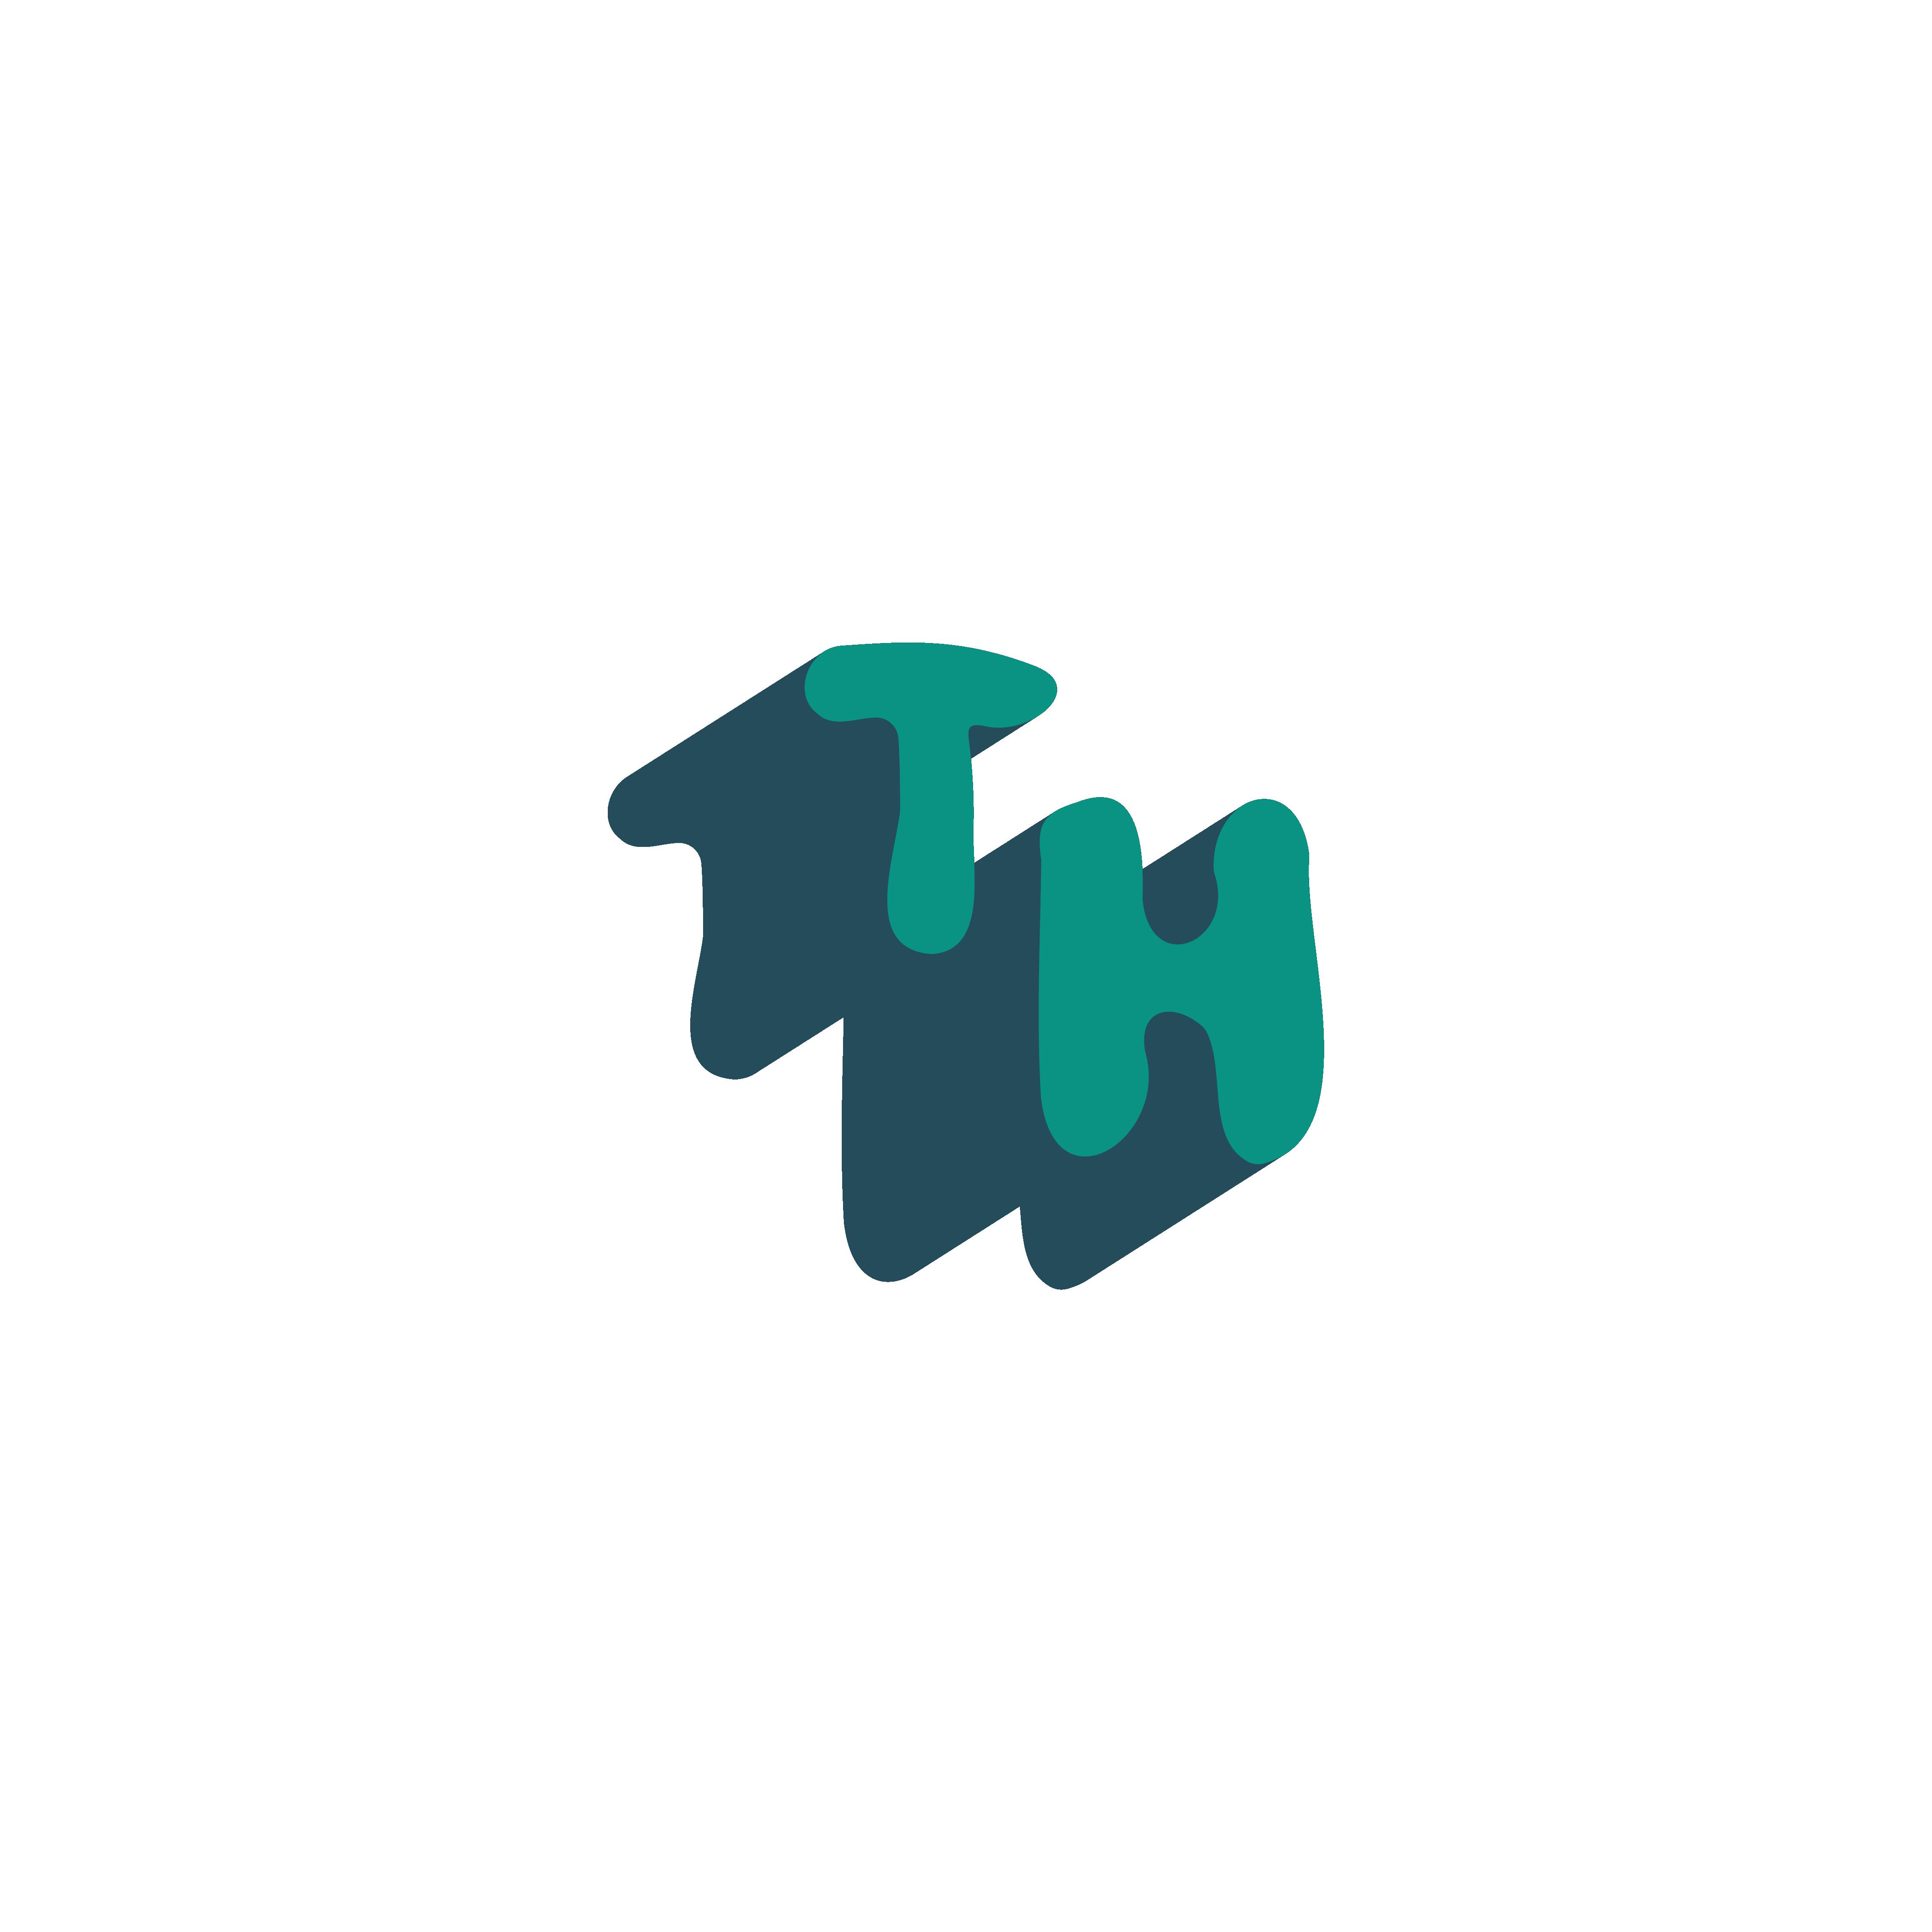 TH_Secondary_Light_Icon